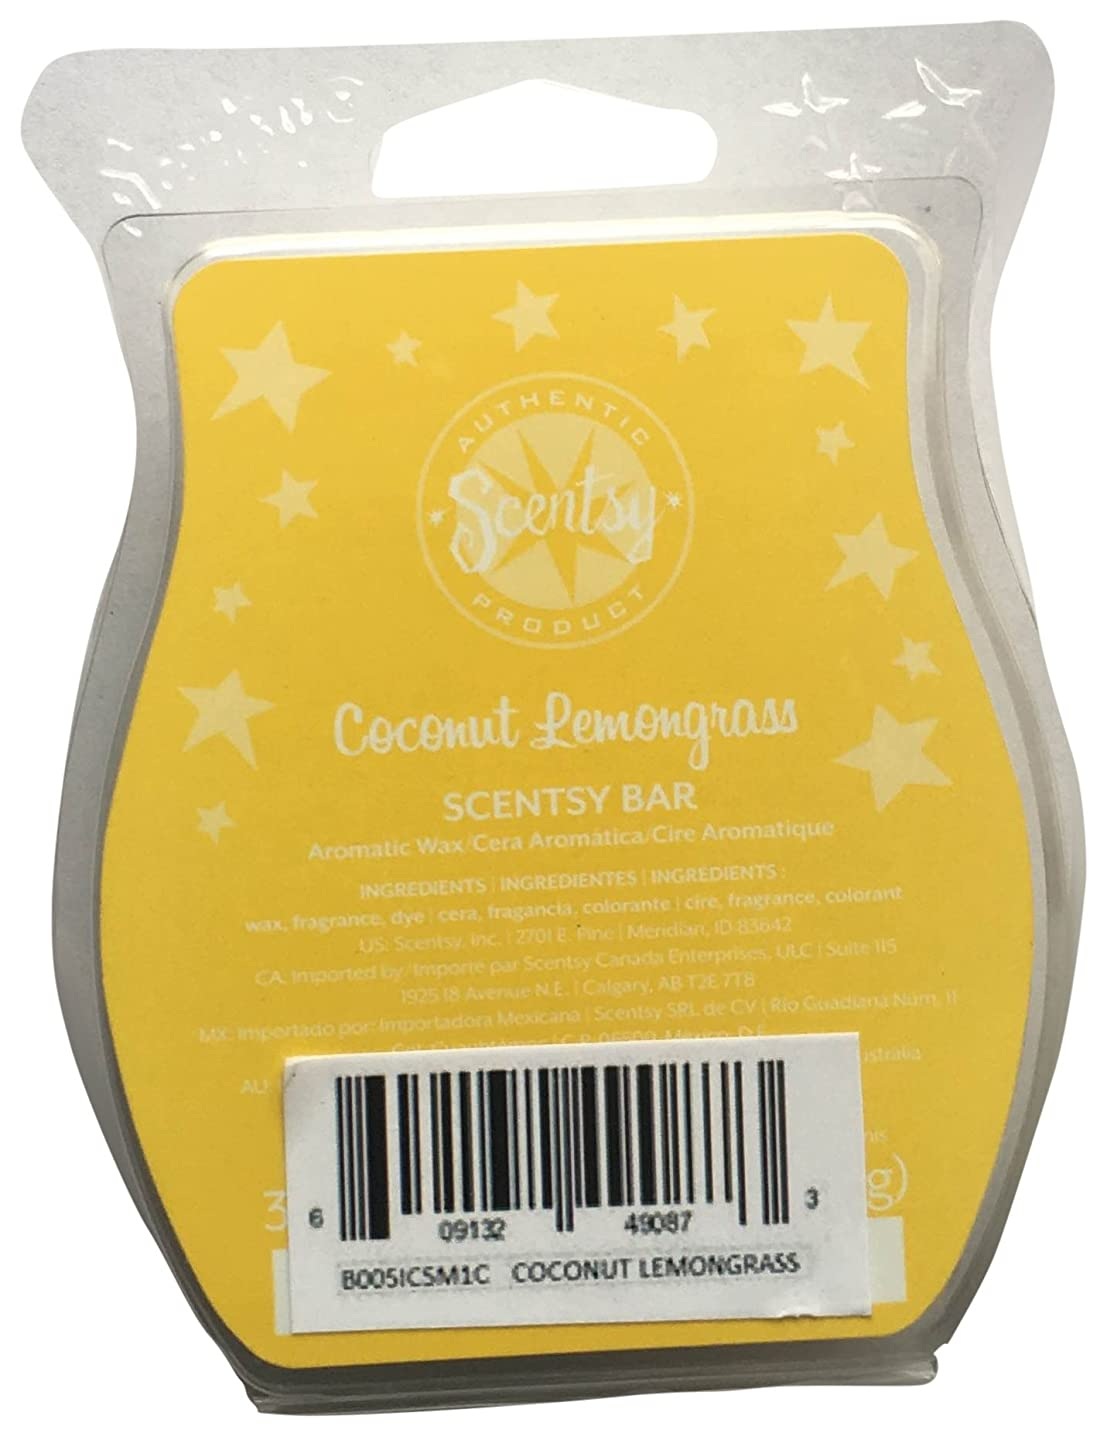 Scentsy Coconut Lemongrass Bar Wickless Candle Tart Warmer Wax, 3.2 fl. oz.